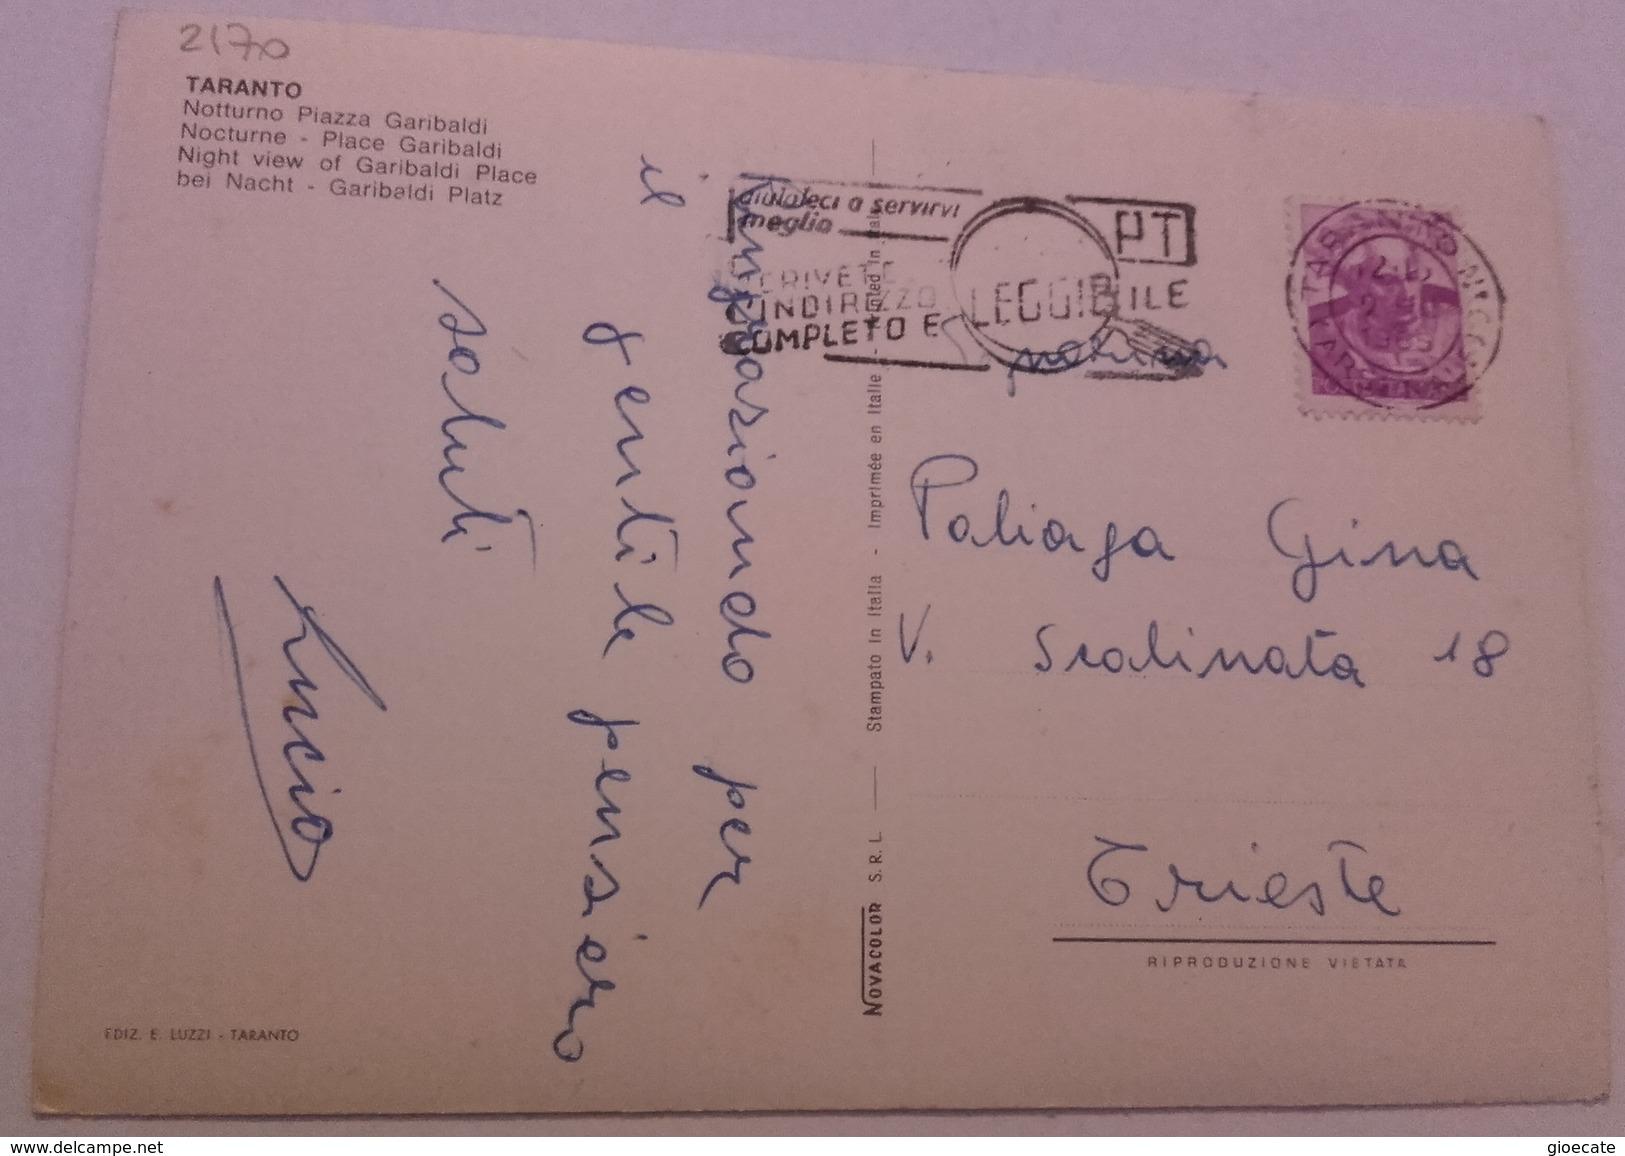 TARANTO – NOTTURNO PIAZZA GARIBALDI – VIAGG. 1965 – (2170) - Taranto